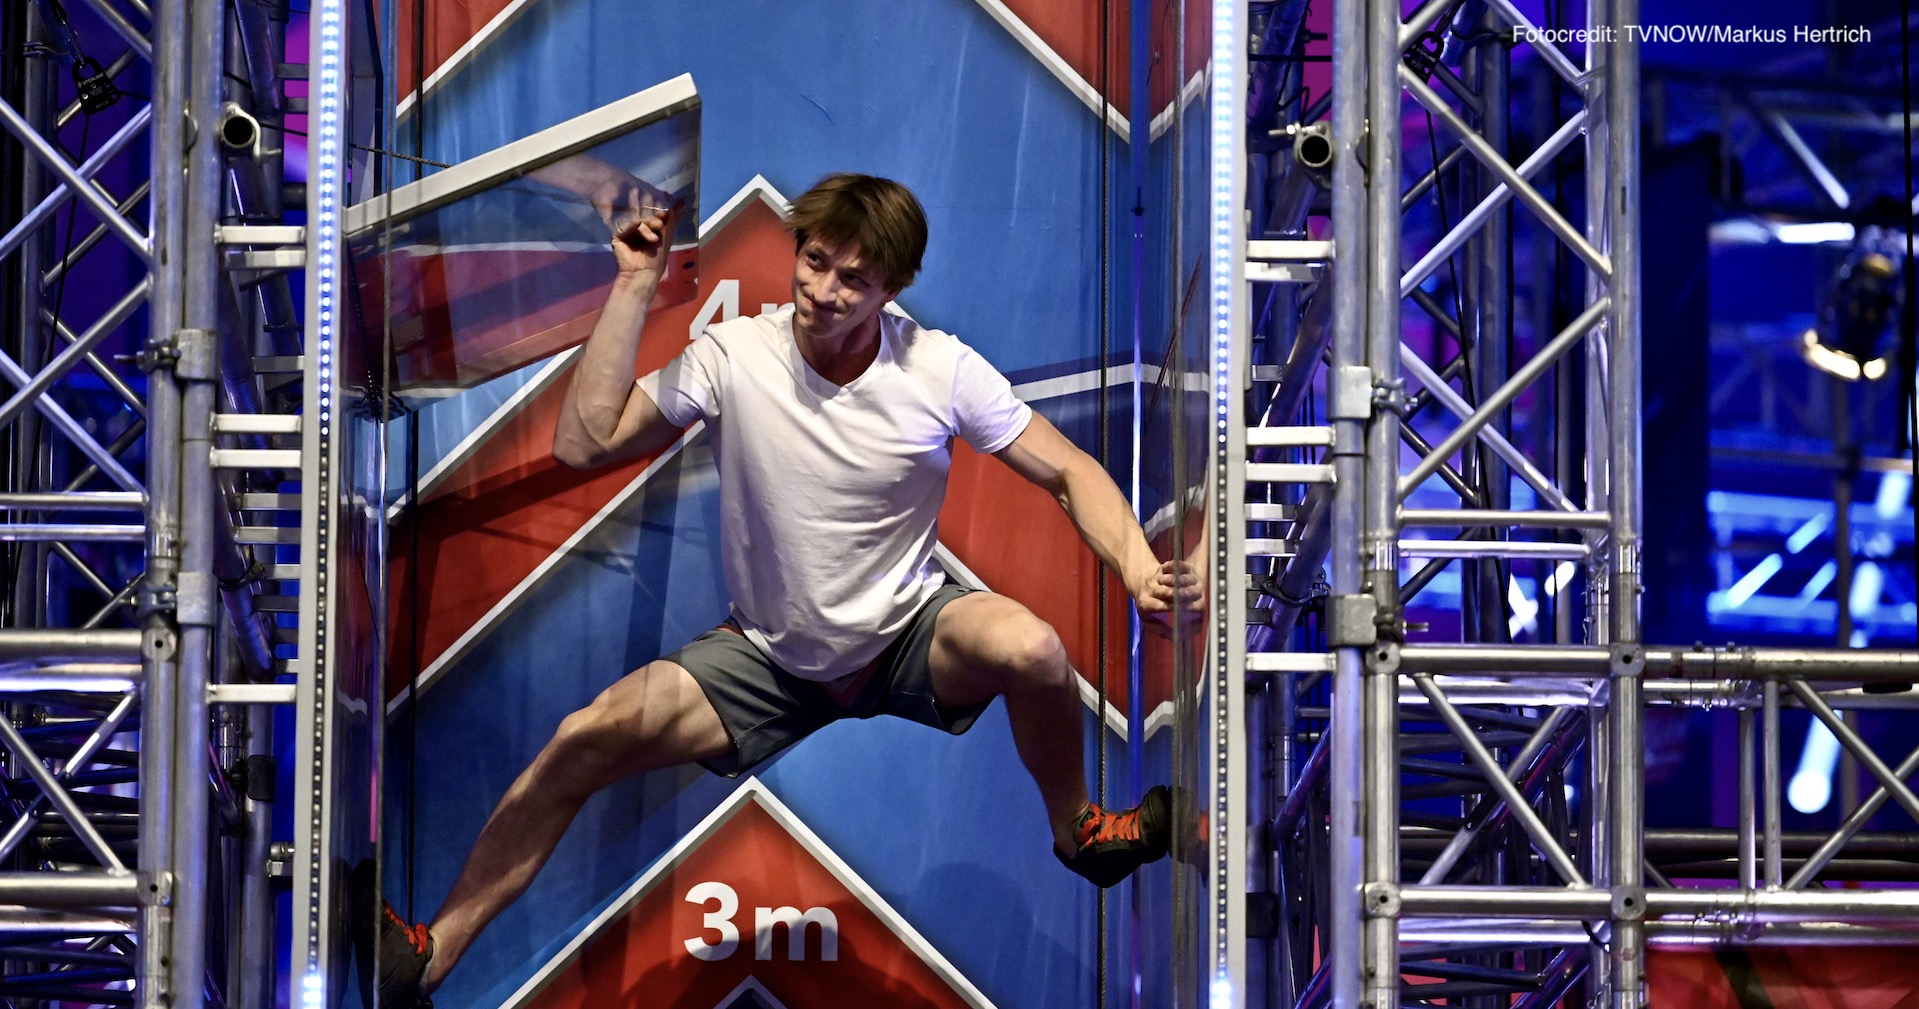 Moritz Hans wird Zweiter bei Ninja Warrior Germany